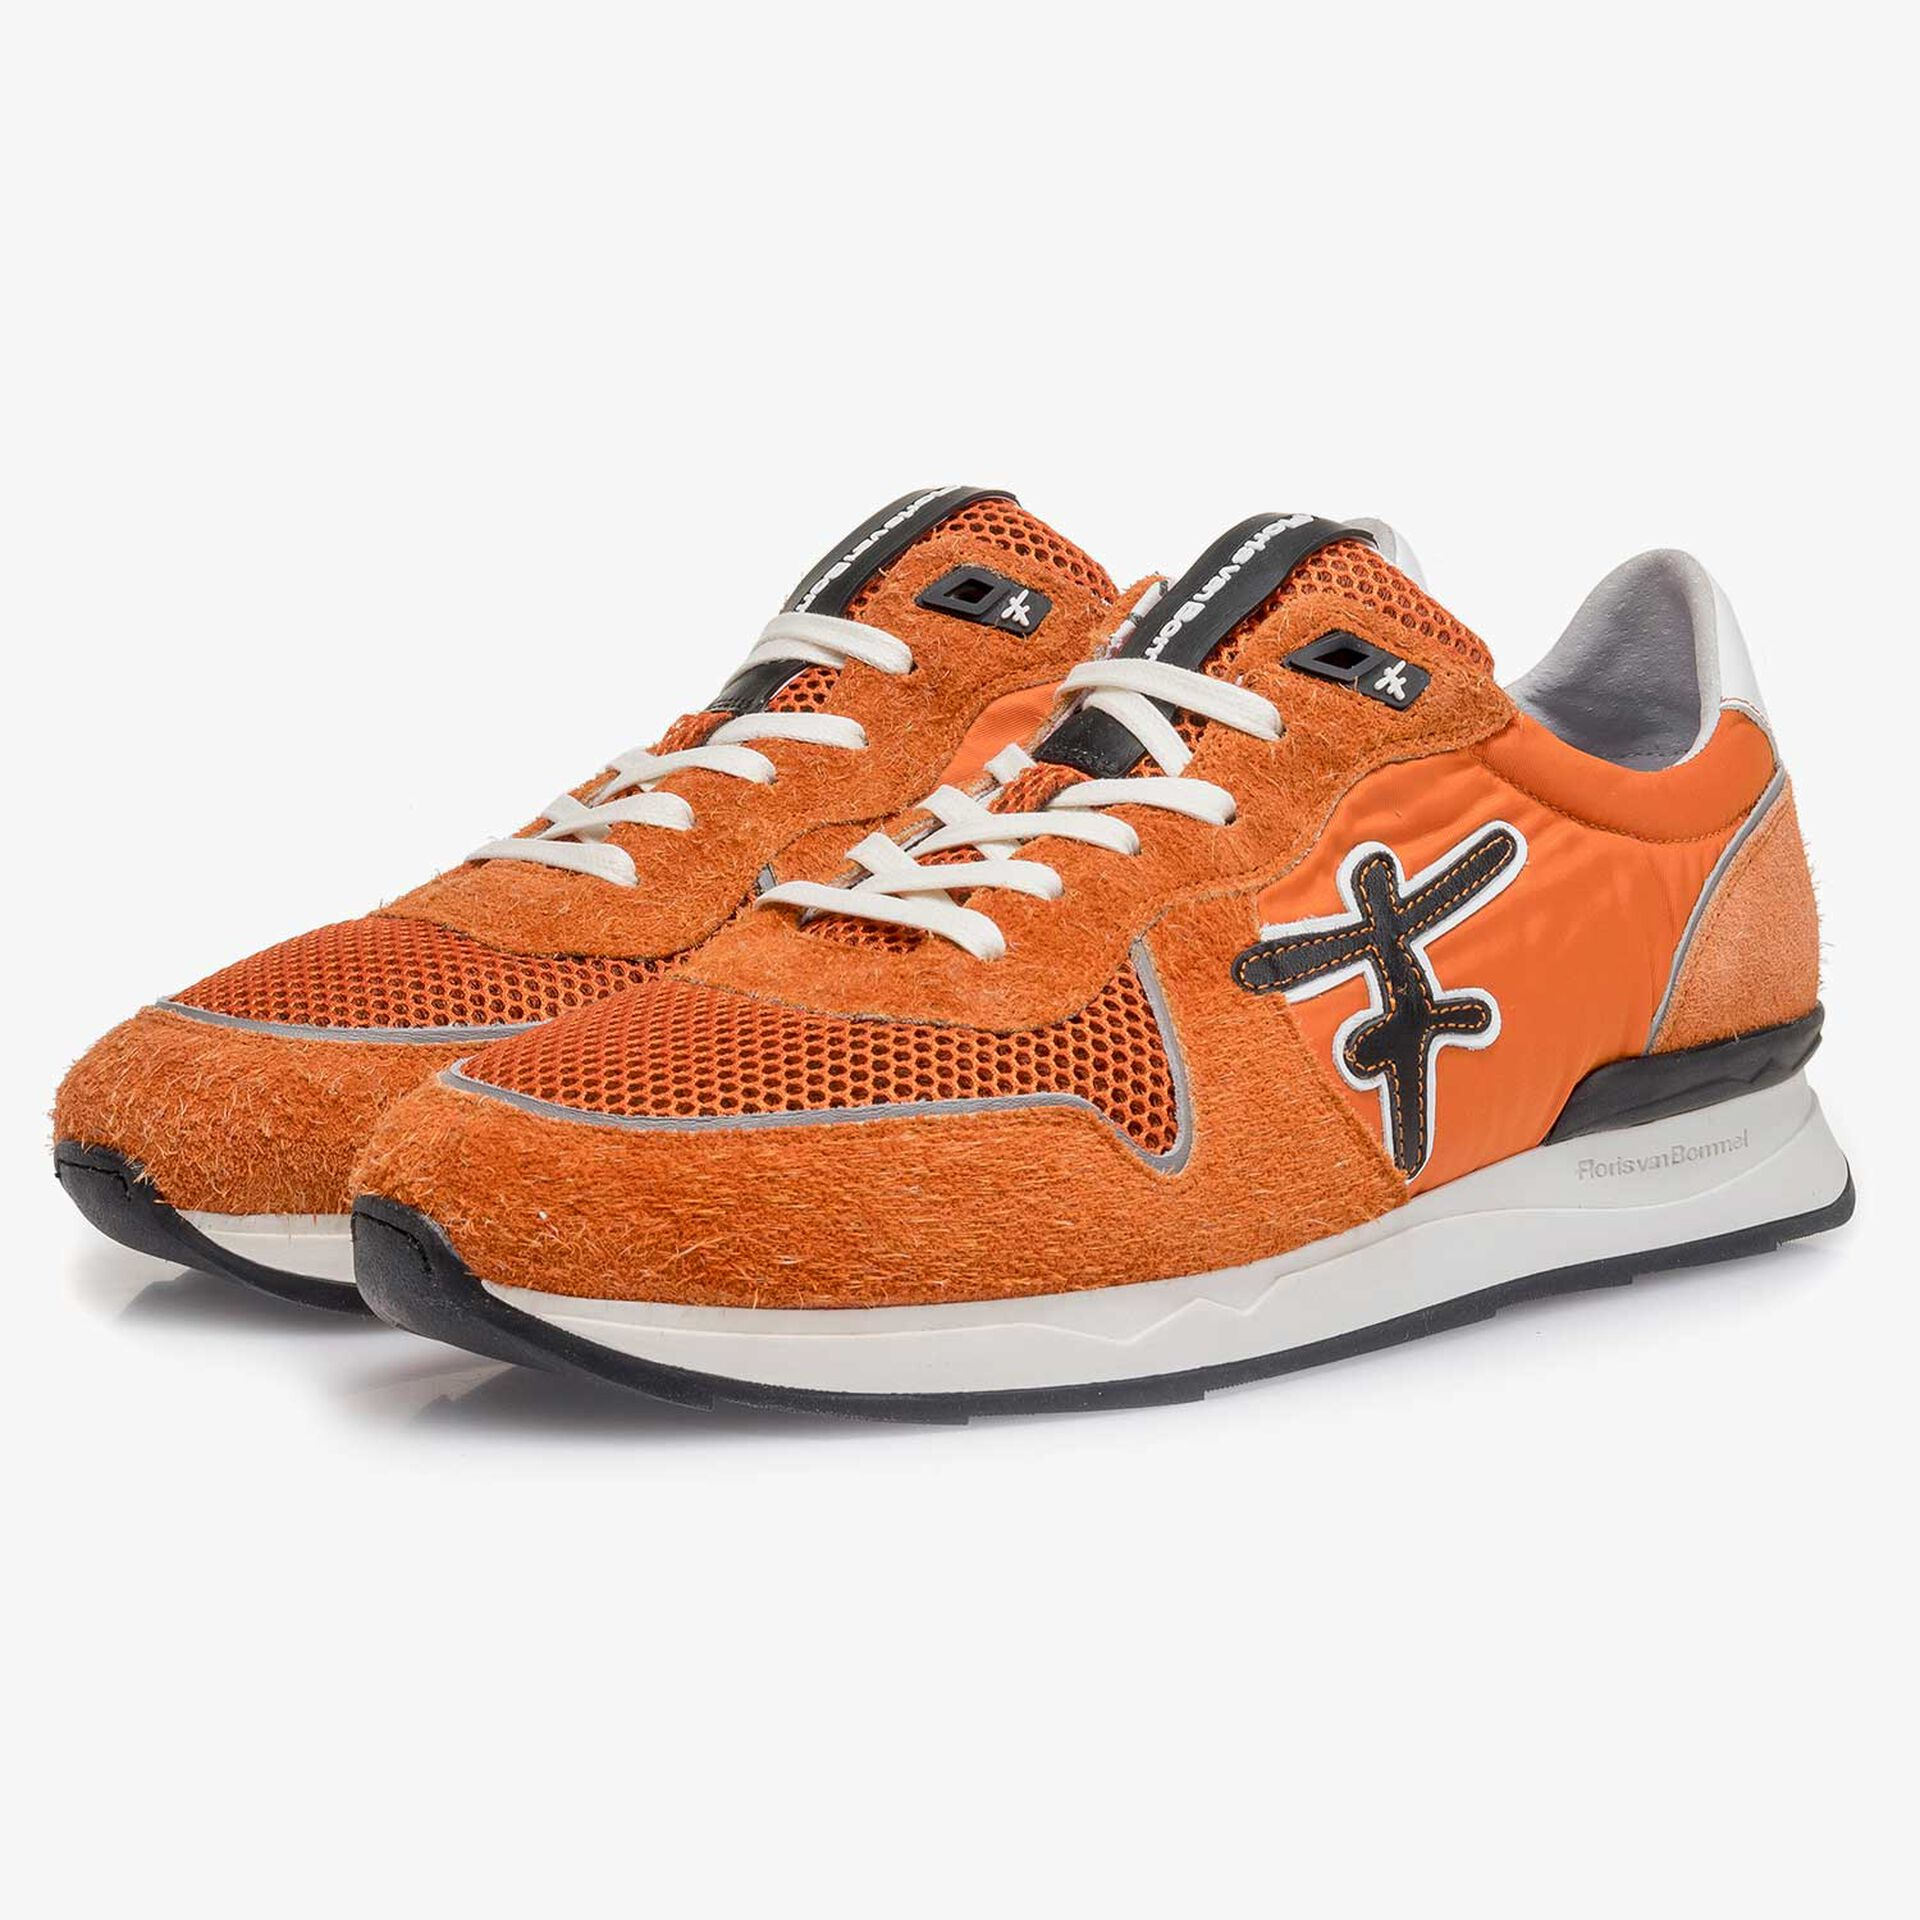 Suède sneaker oranje/zwart